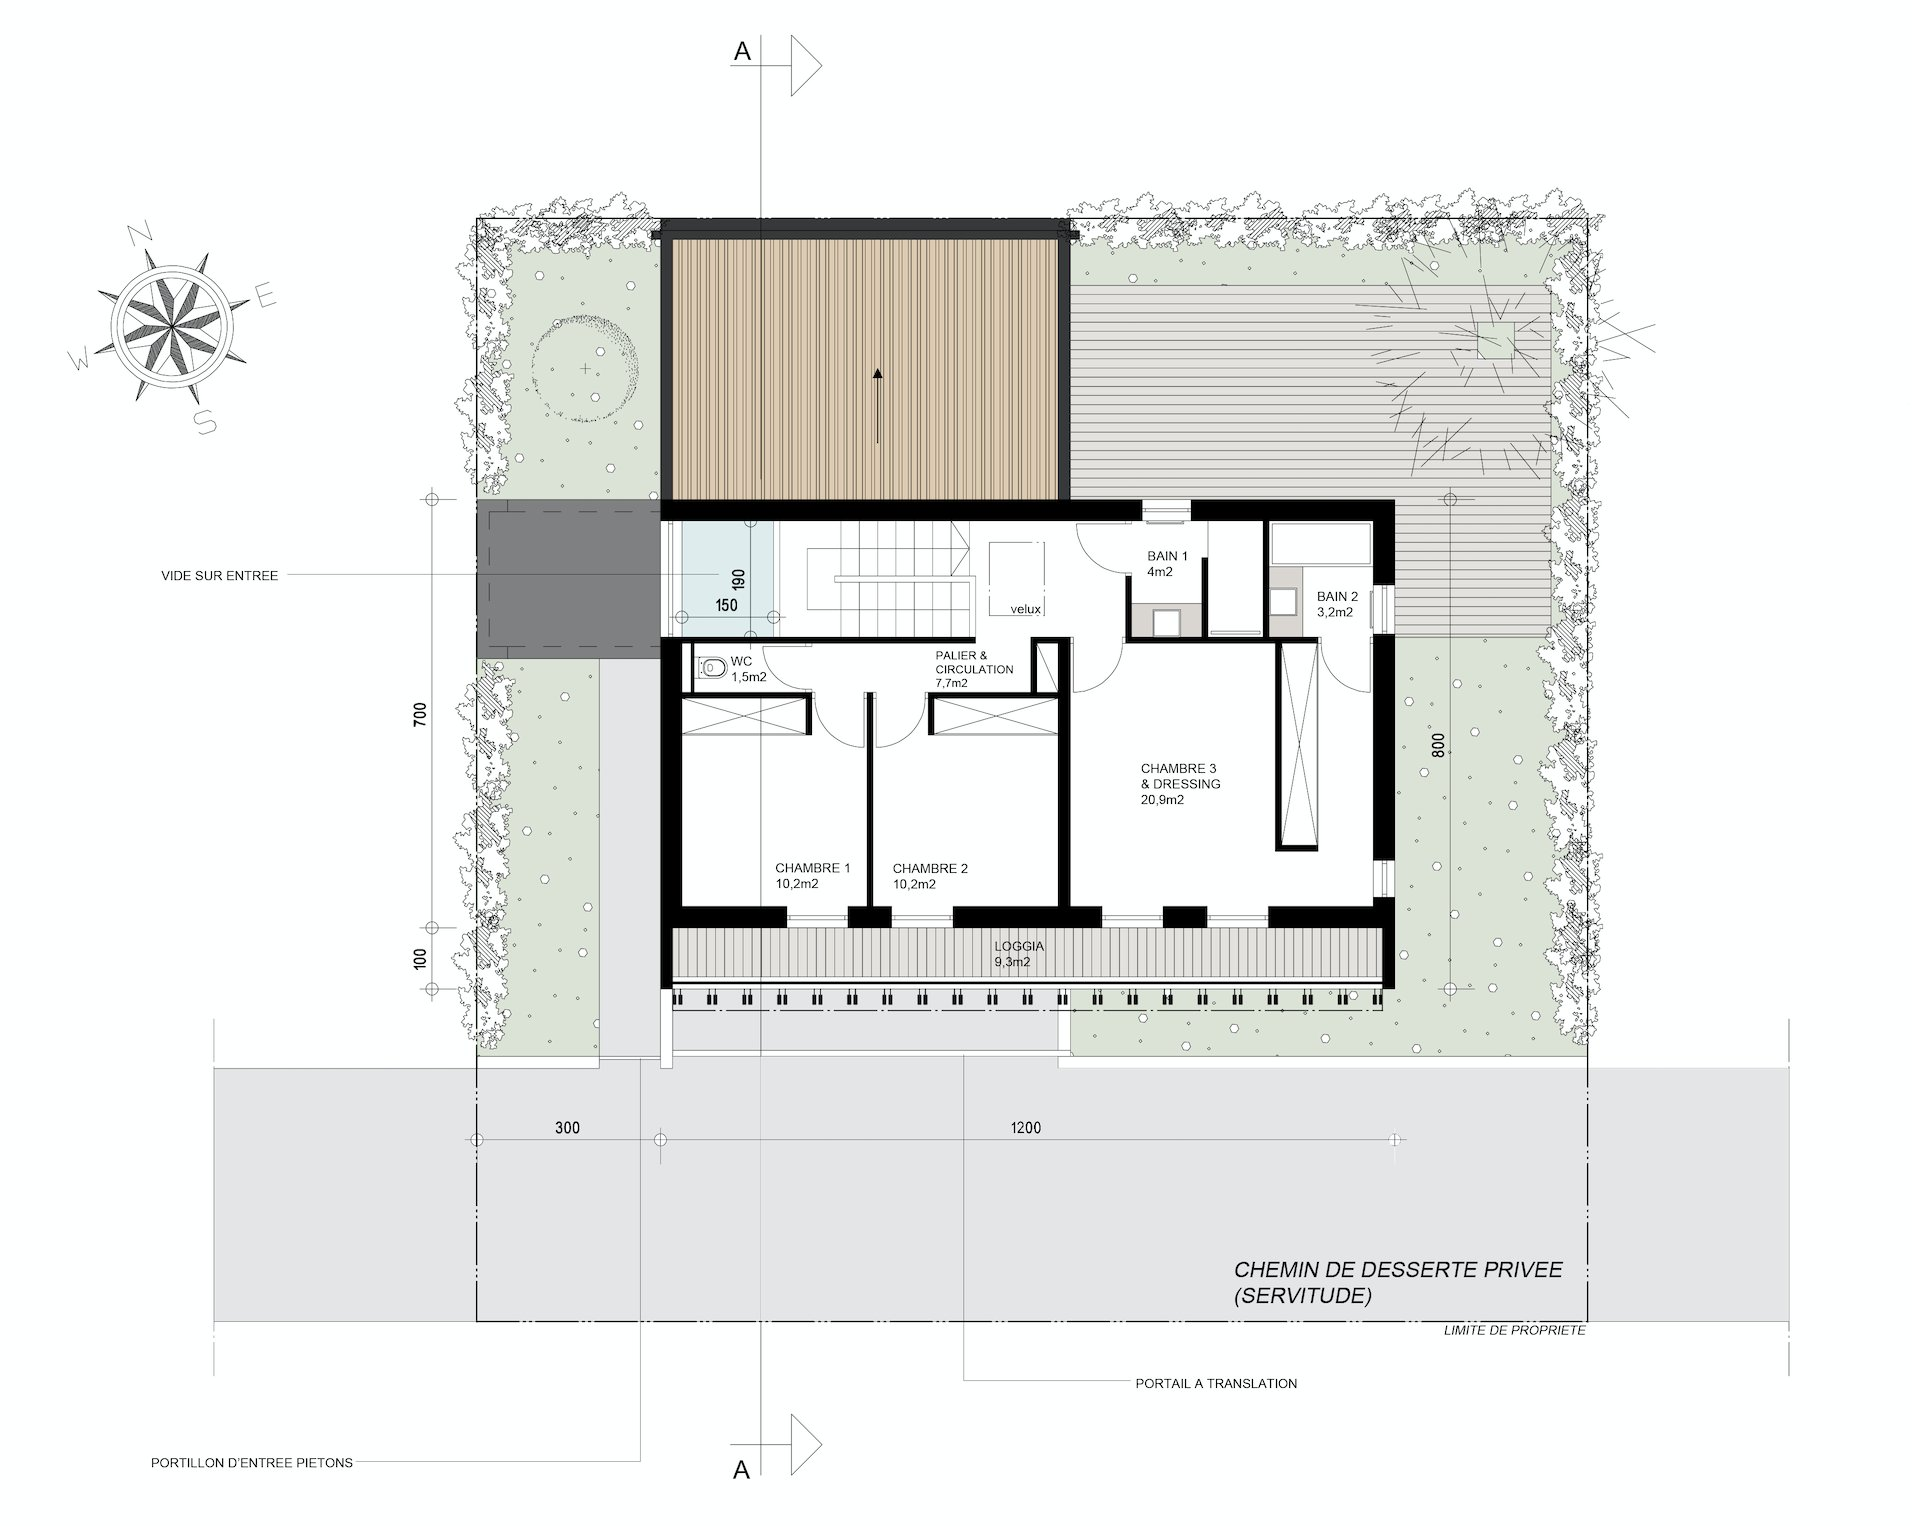 Venta Terreno urbanizable - Meyreuil